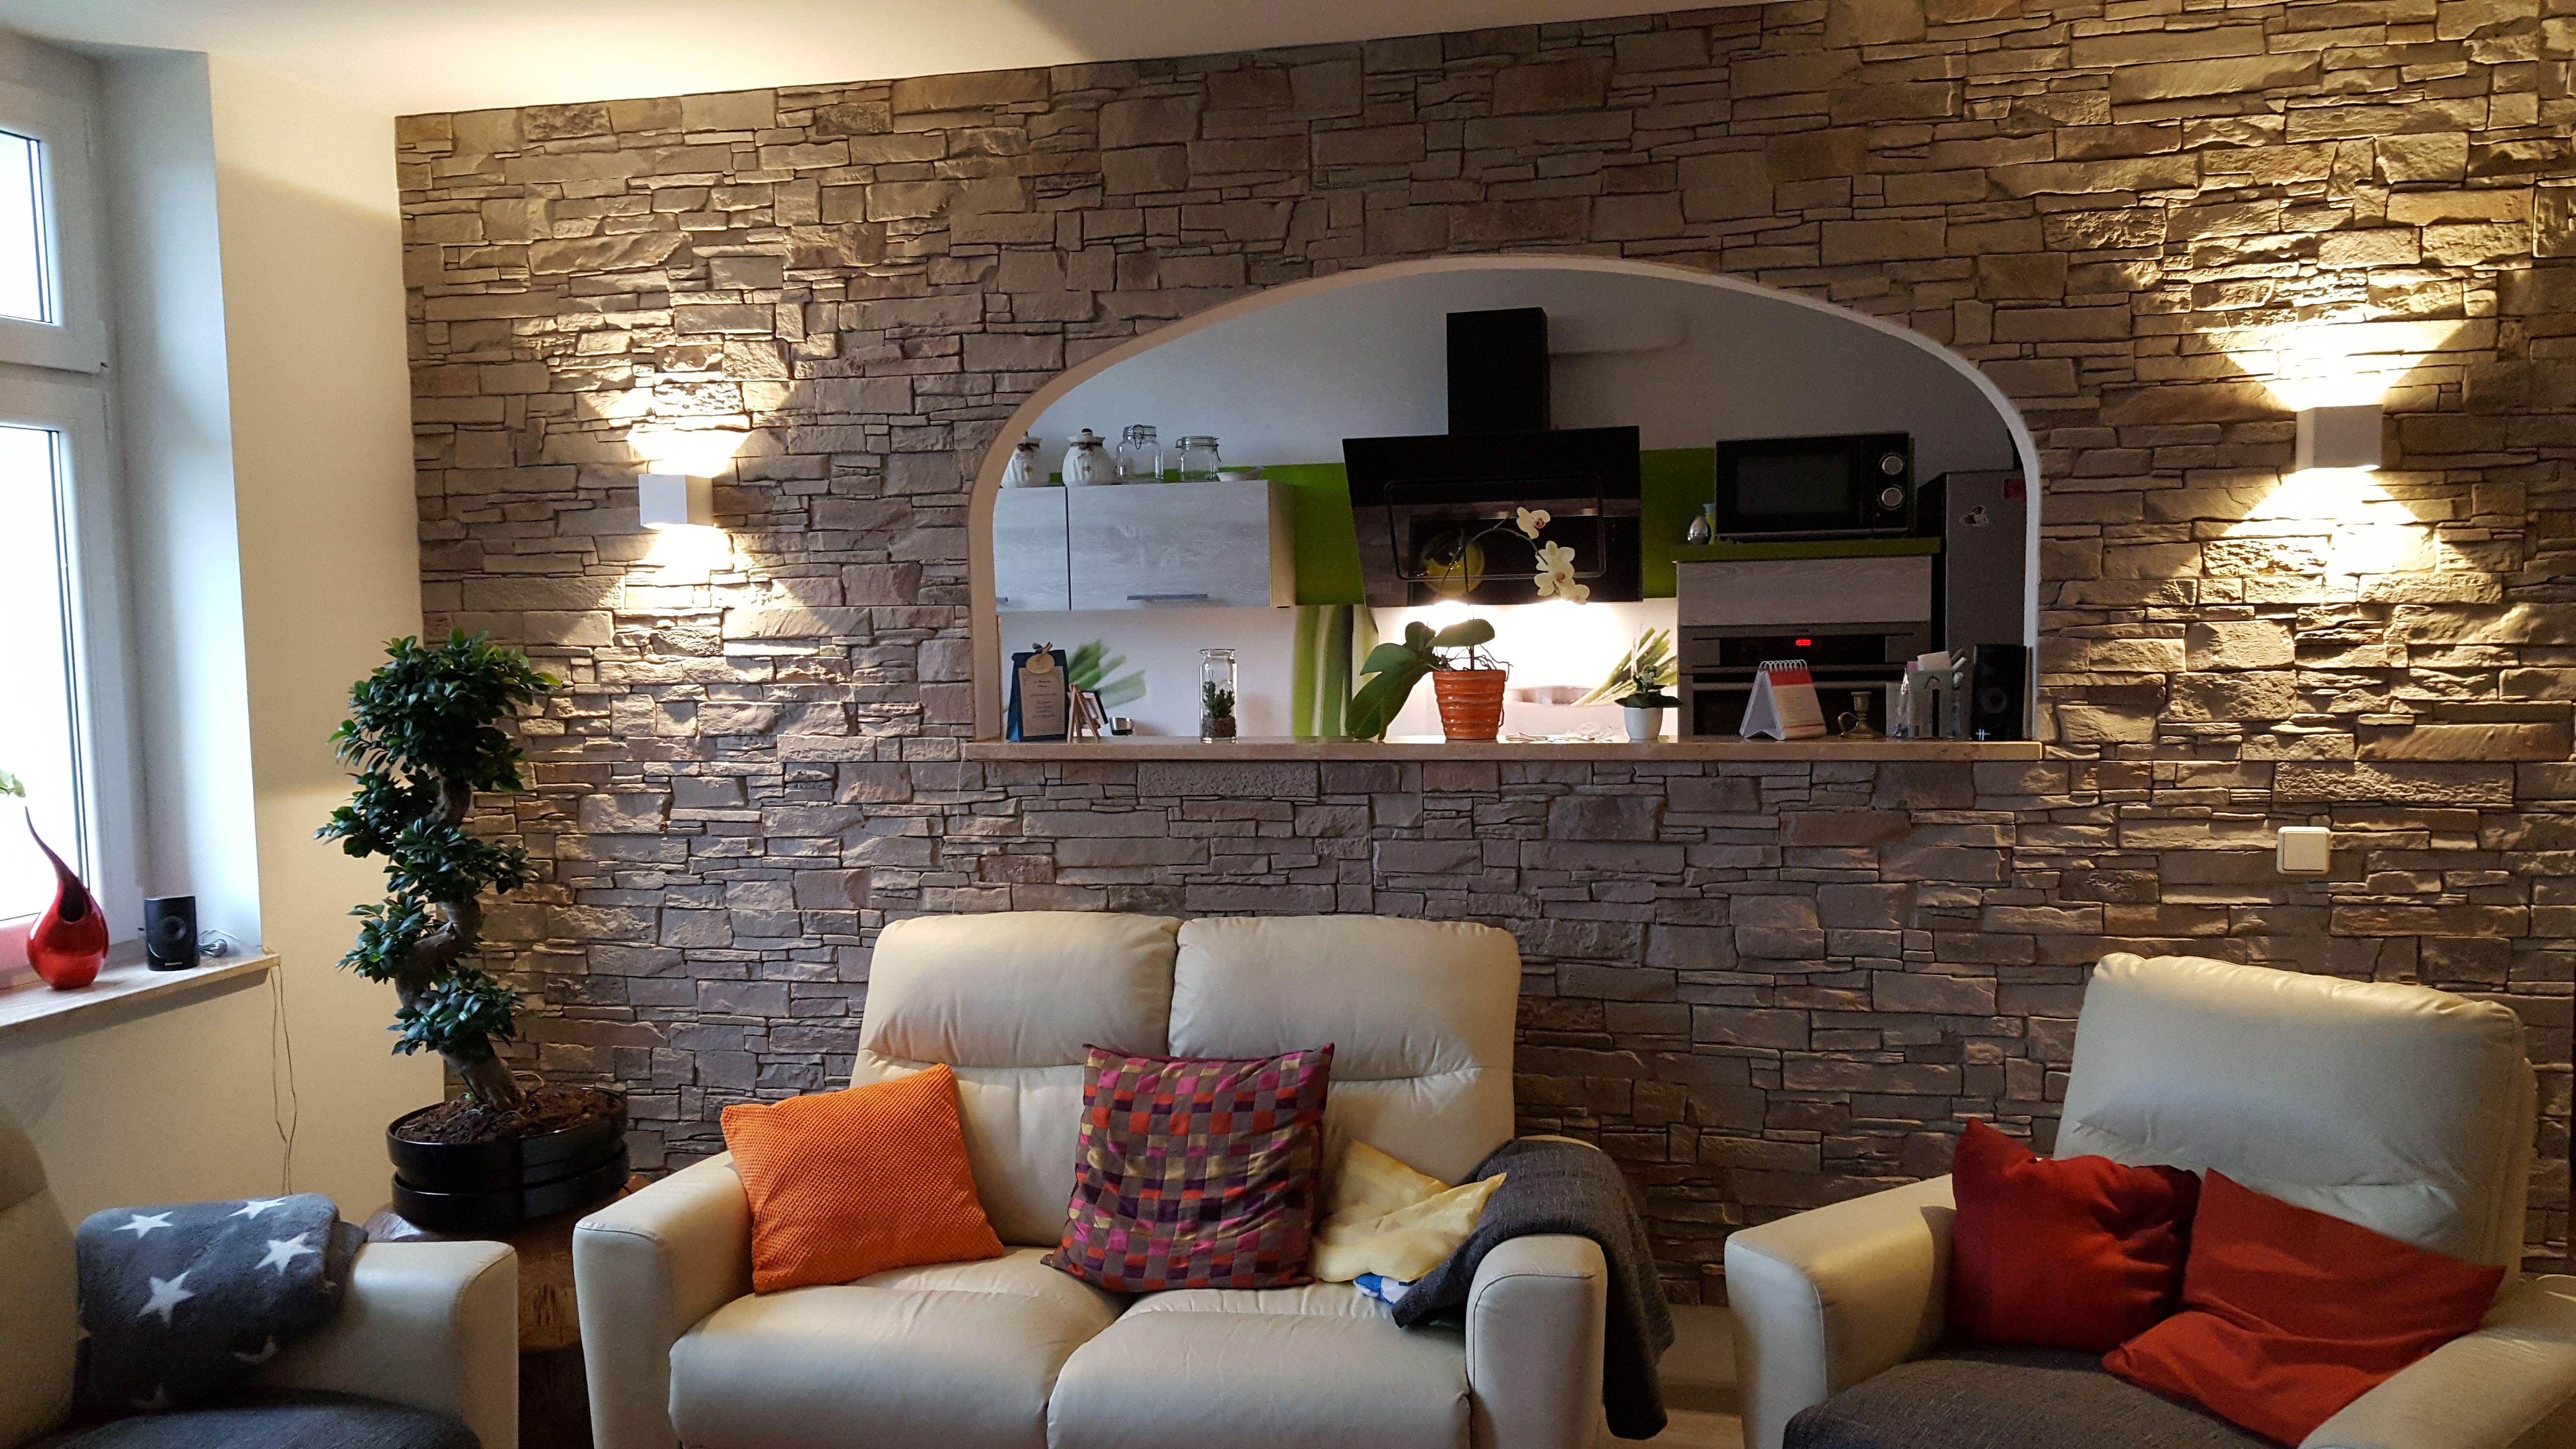 Newwalls steinpaneele bildergalerie steinpaneele pinterest paneele wandgestaltung paneele - Wandgestaltung bildergalerie ...